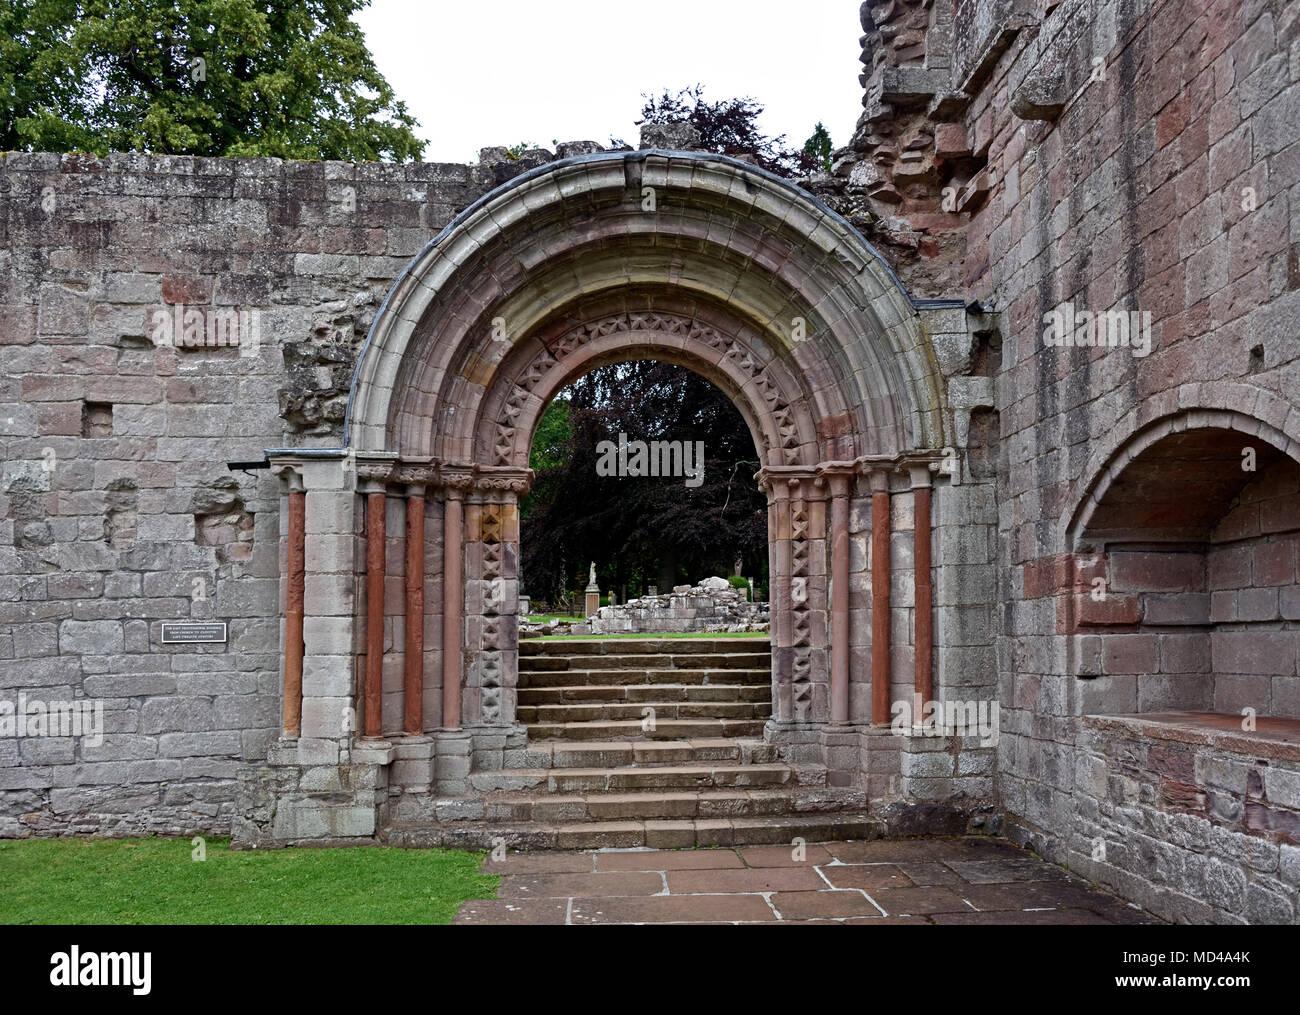 Detail of Romanesque doorway. Dryburgh Abbey. Dryburgh, St.Boswells, Roxburghshire, Scottish Borders, Scotland, United Kingdom, Europe. - Stock Image